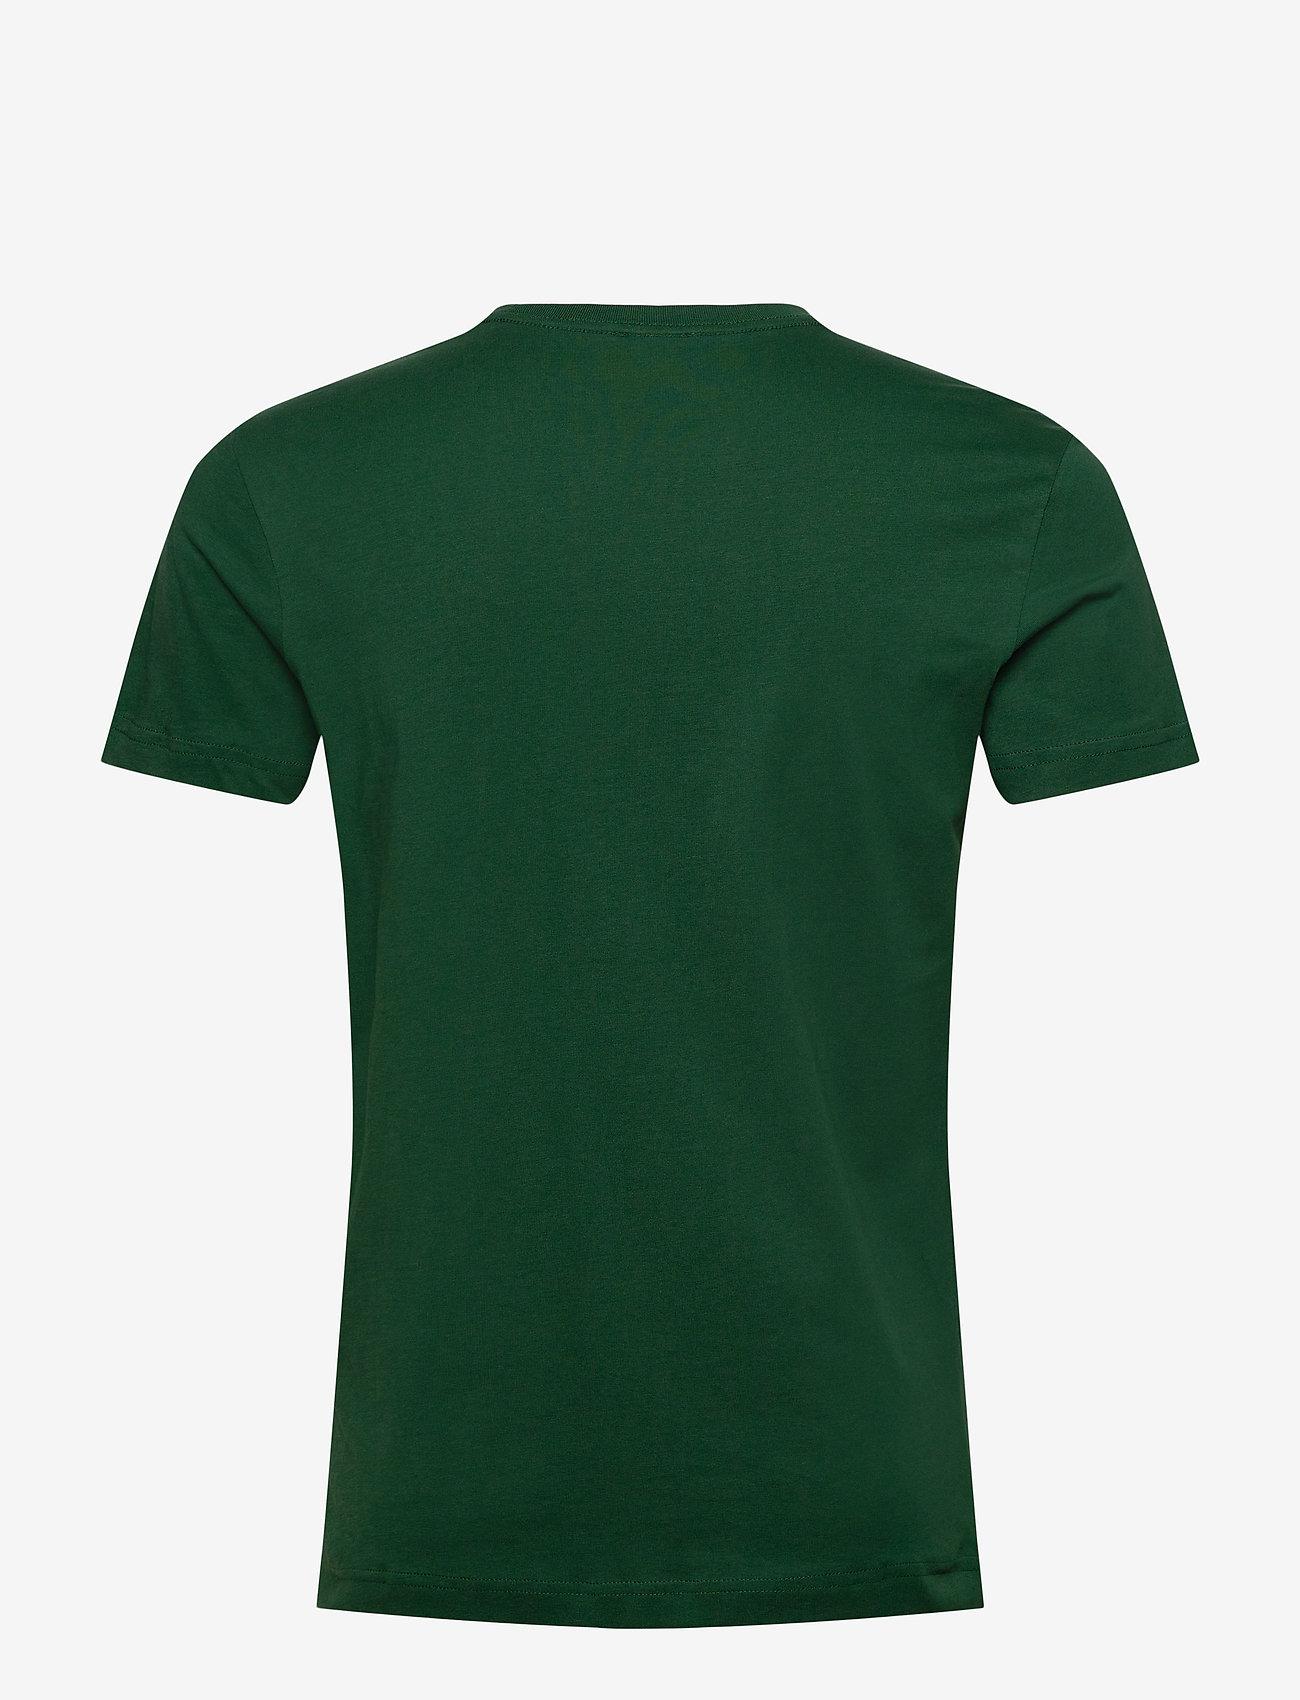 Diesel Men - T-DIEGO-LOGO T-SHIRT - short-sleeved t-shirts - green - 1